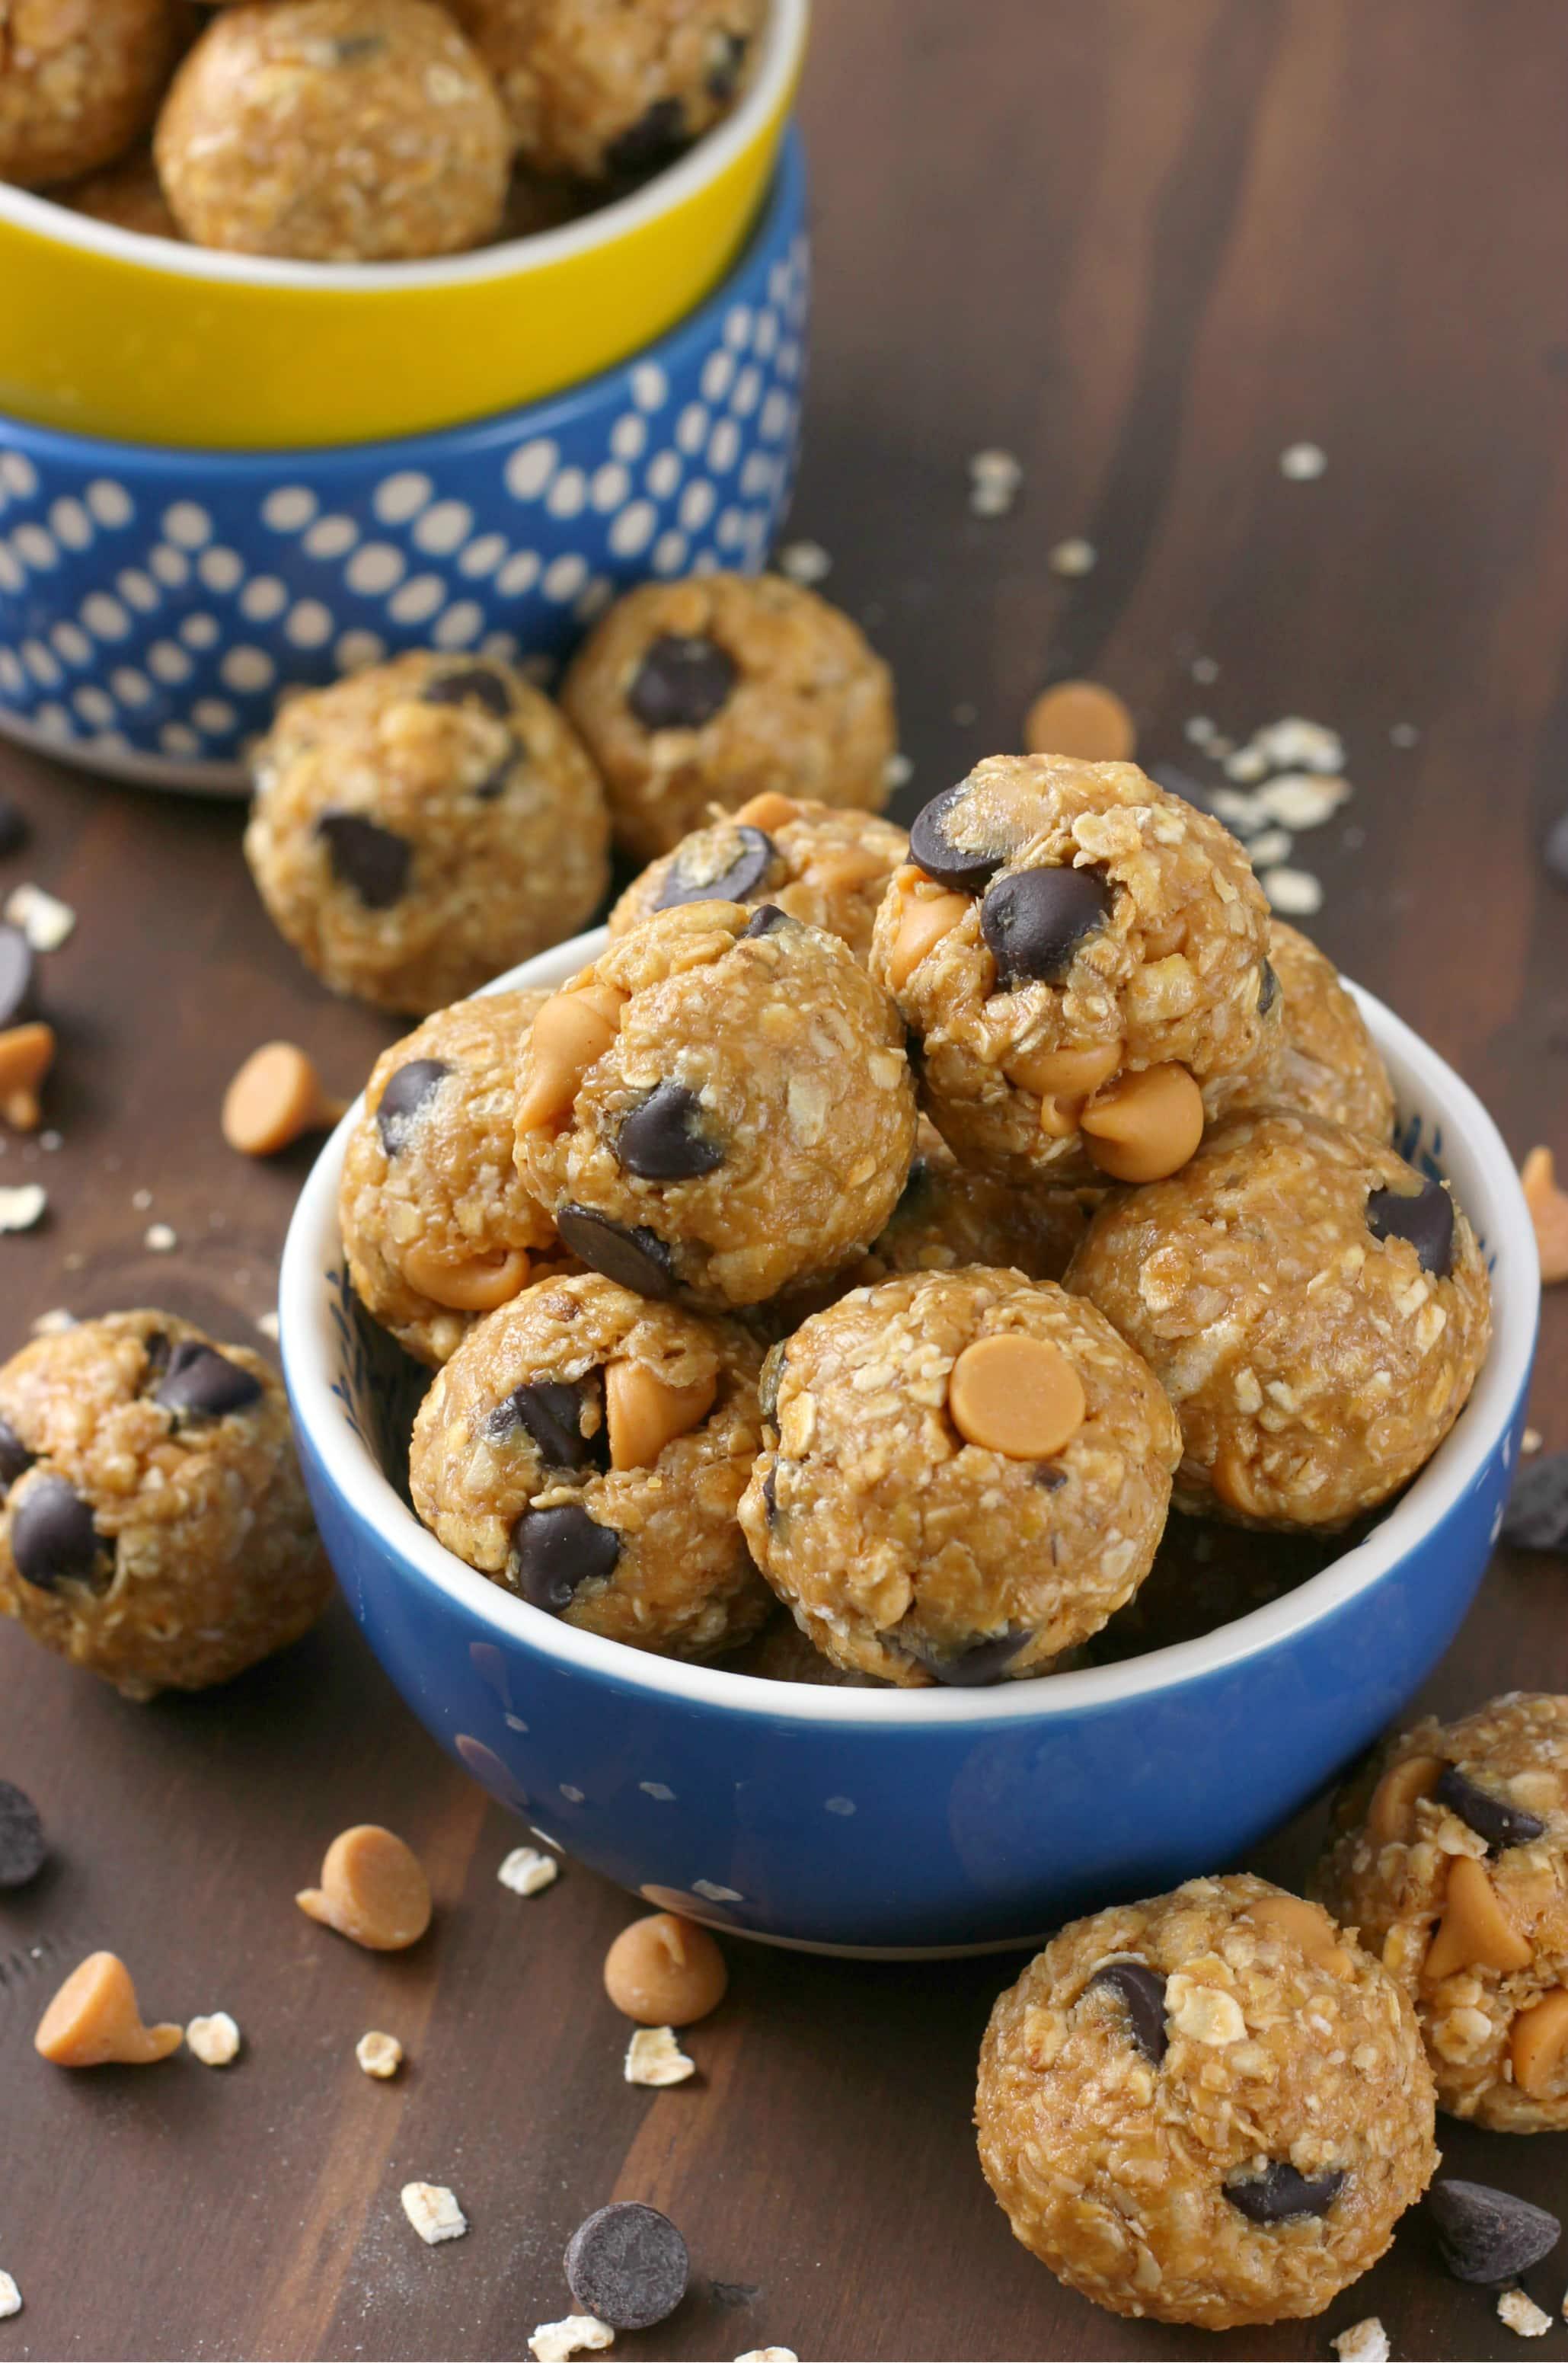 Peanut Butter Dark Chocolate Chip No Bake Granola Bites Recipe from A Kitchen Addiction